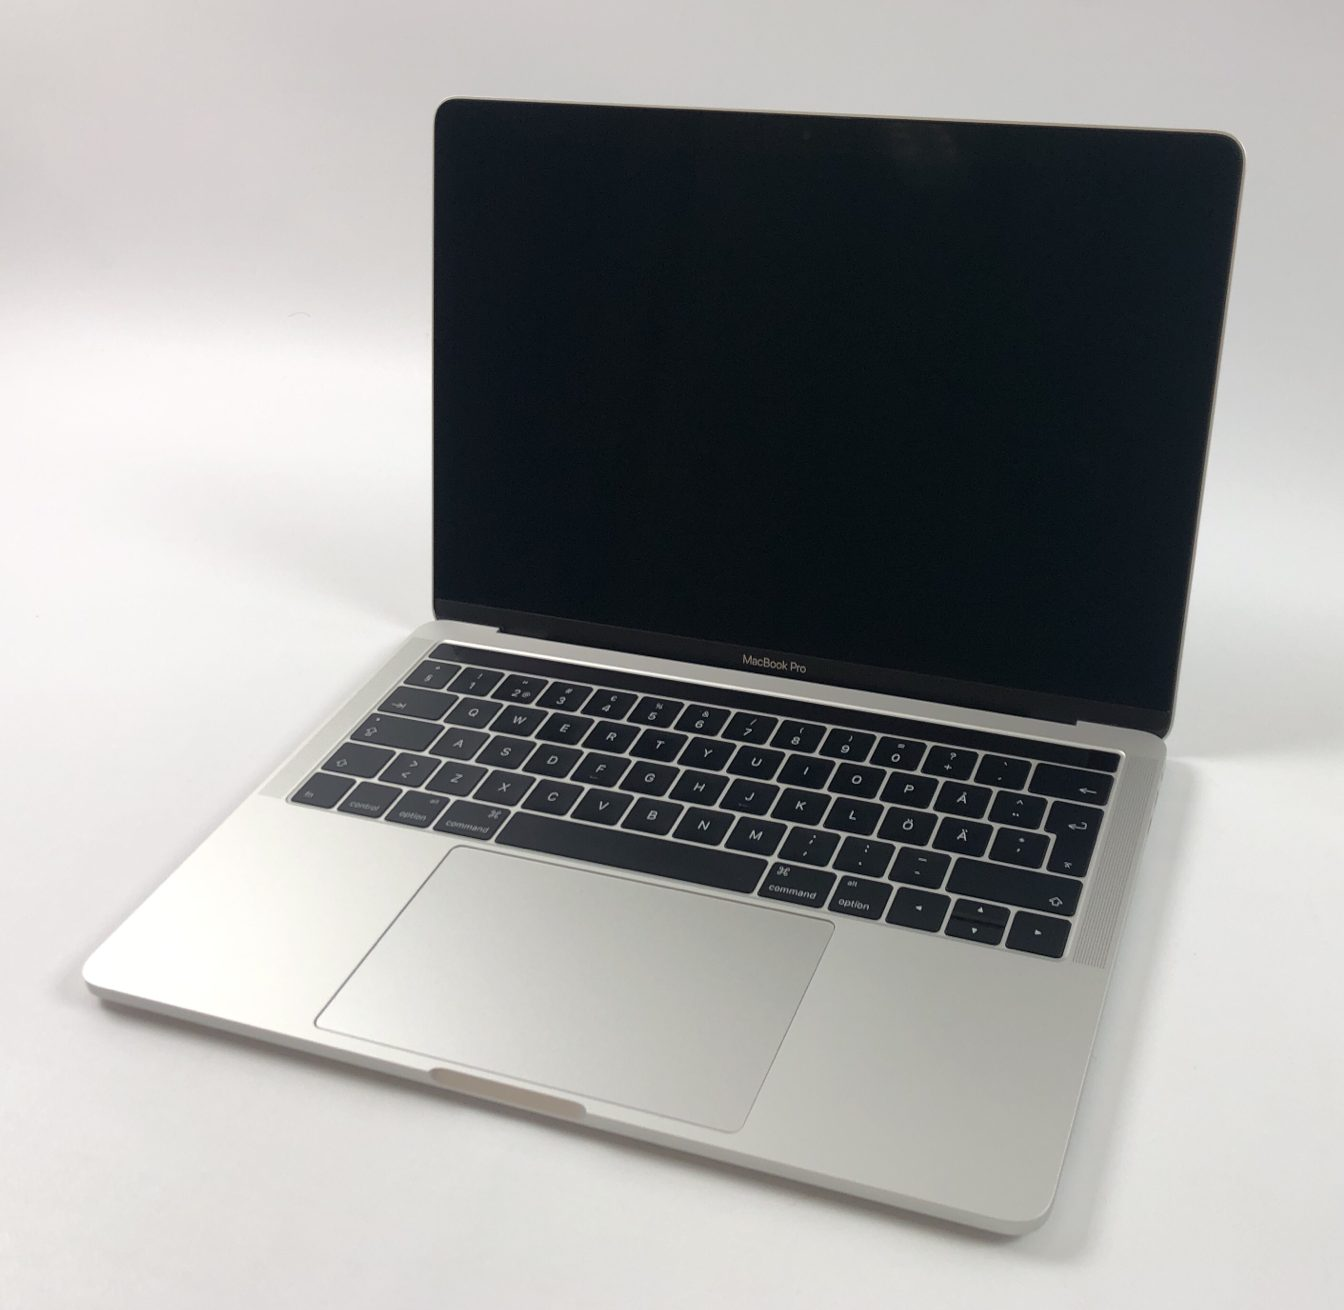 "MacBook Pro 13"" 4TBT Late 2016 (Intel Core i5 2.9 GHz 8 GB RAM 512 GB SSD), Silver, Intel Core i5 2.9 GHz, 8 GB RAM, 512 GB SSD, bild 1"